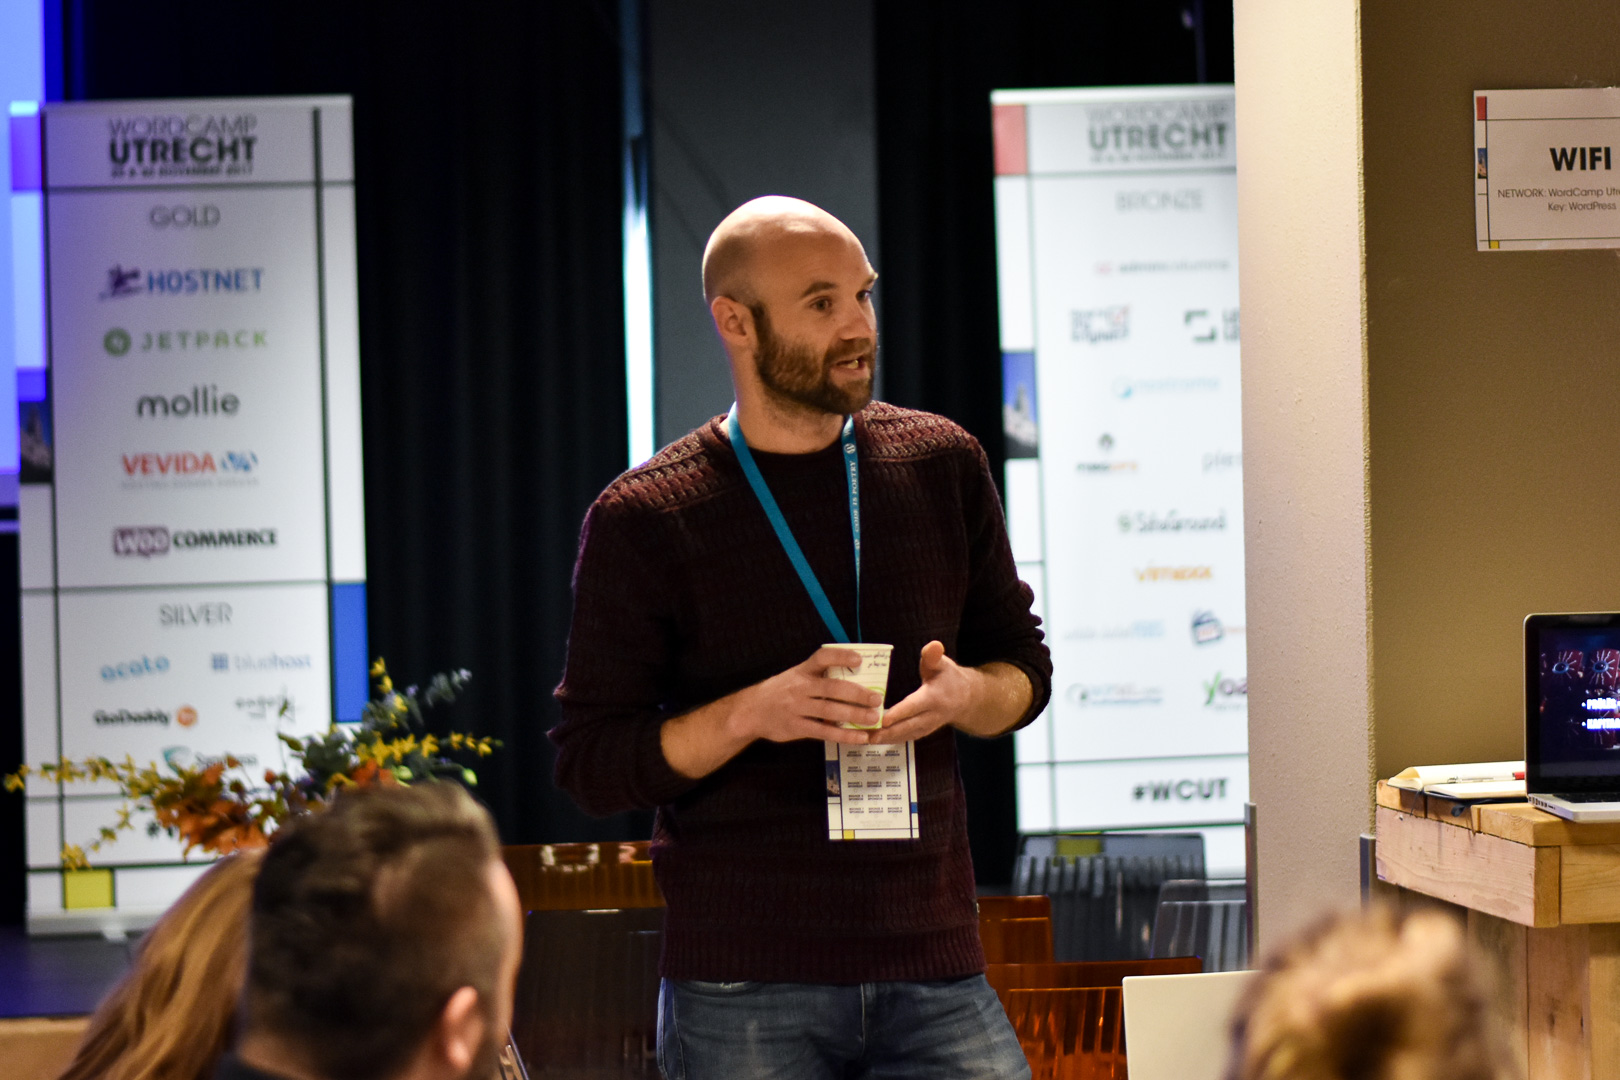 WordCamp Utrecht, Maik Gruppen, Savvii